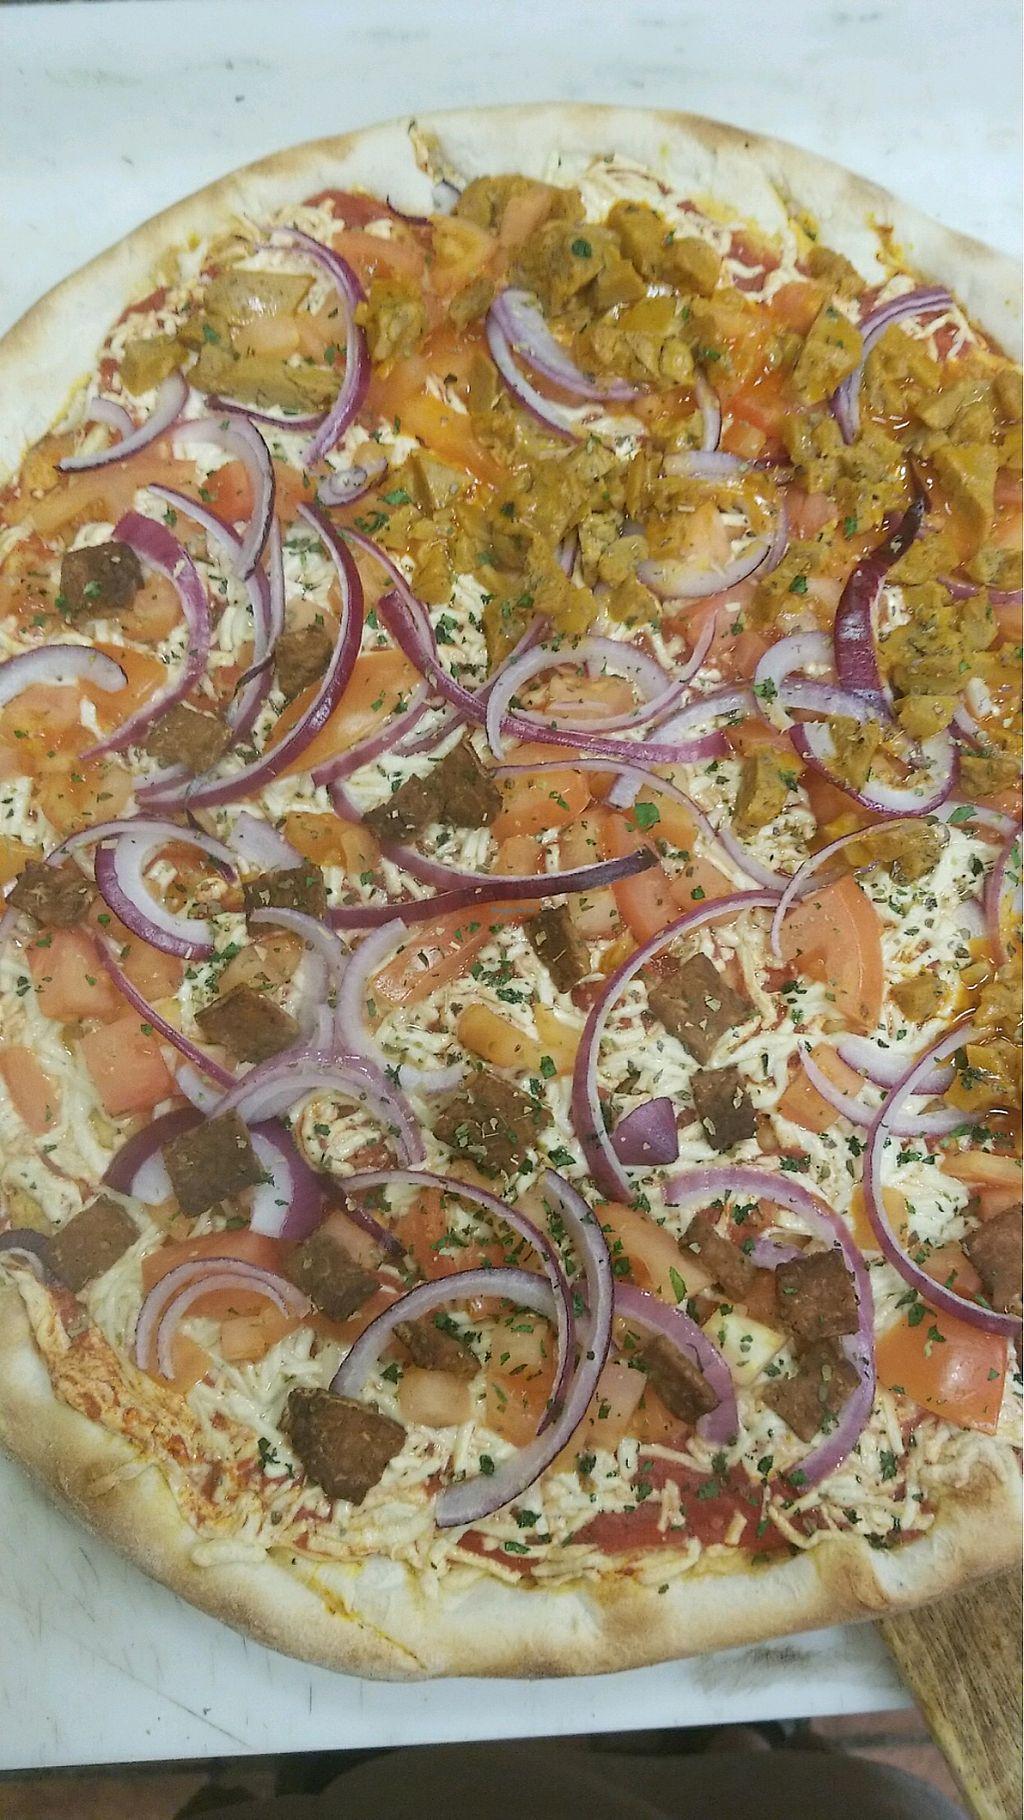 "Photo of Pizza Mia  by <a href=""/members/profile/ErinO%E2%80%99Brien"">ErinO'Brien</a> <br/>Half tempeh Facon with red onions and tomatoes, half buffalo seitan fajita with red onion and tomato  <br/> January 8, 2018  - <a href='/contact/abuse/image/108250/344184'>Report</a>"